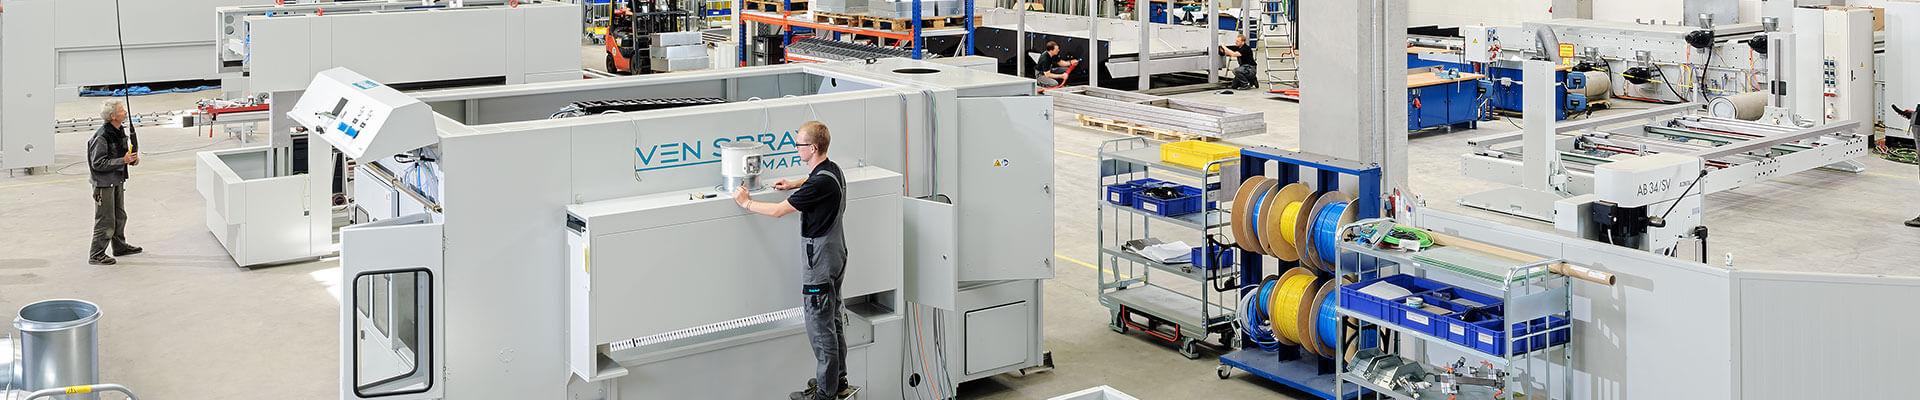 Venjakob Maschinenbau GmbH & Co. KG